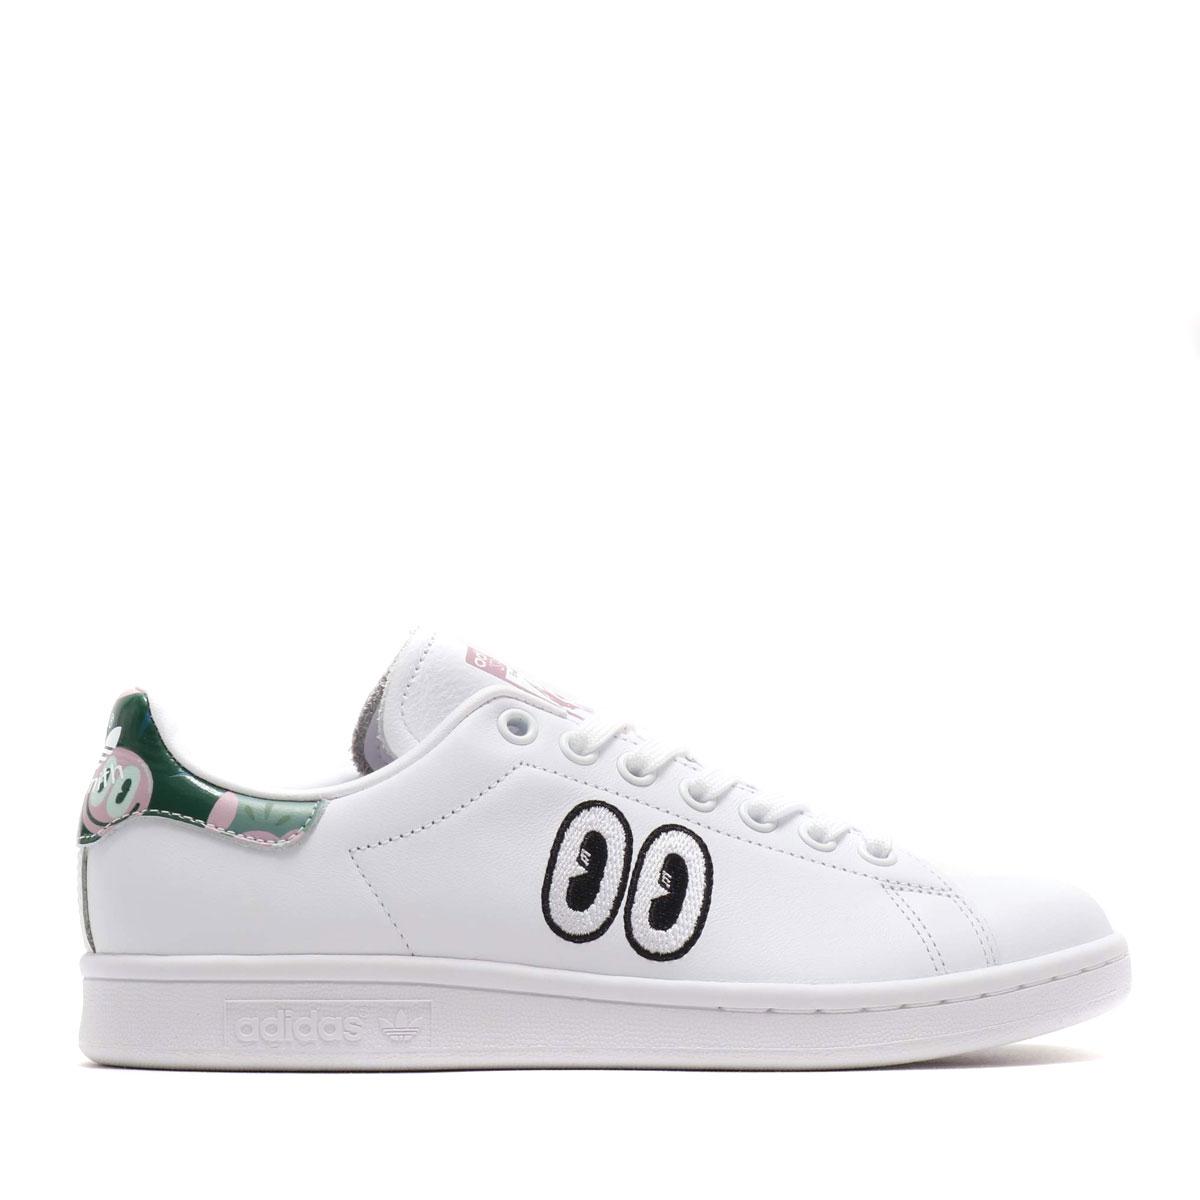 adidas Originals STAN SMITH W(RUNNING WHITE/SOFTVISION/CORE BLACK)(アディダスオリジナルス スタンスミス W)【メンズ】【レディース】【スニーカー】【19SS-I】